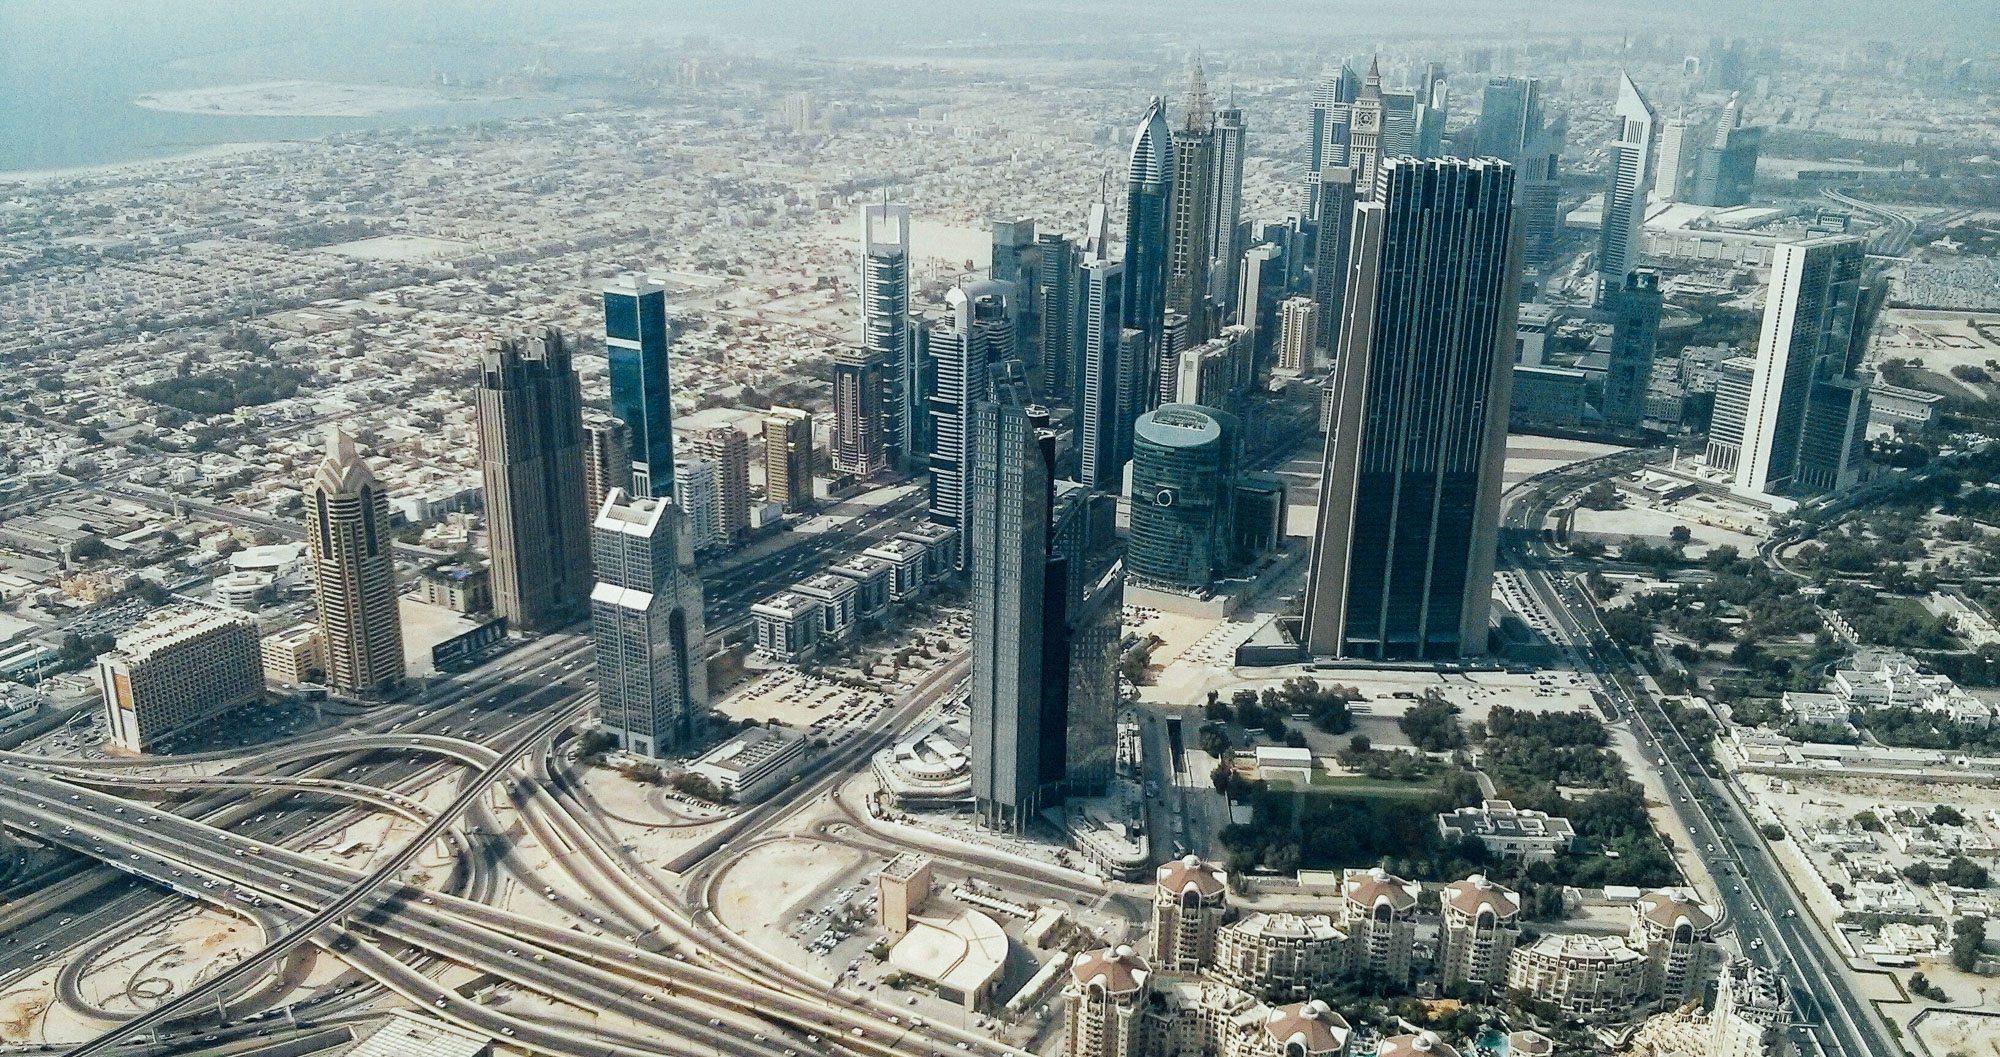 An arial shot of Dubai's skyscrapers